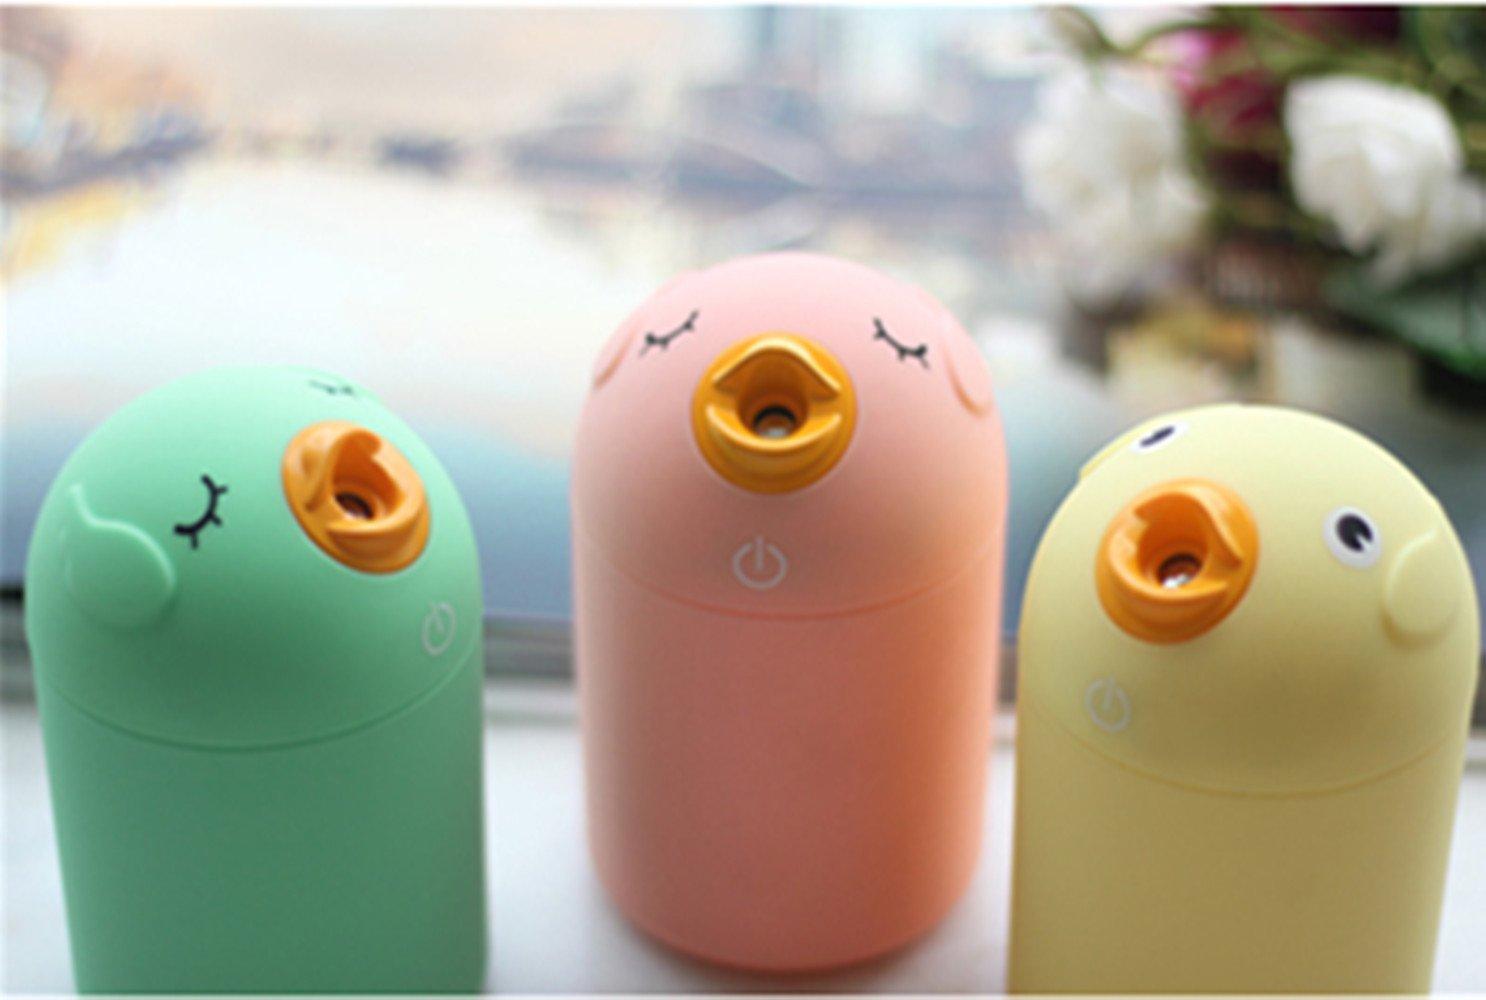 JINBEST Mini Portable USB Charging Ultrasonic Air Humidifier Mist Maker Cute Bird Ultrasonic USB SPA Humidifier (Yellow)